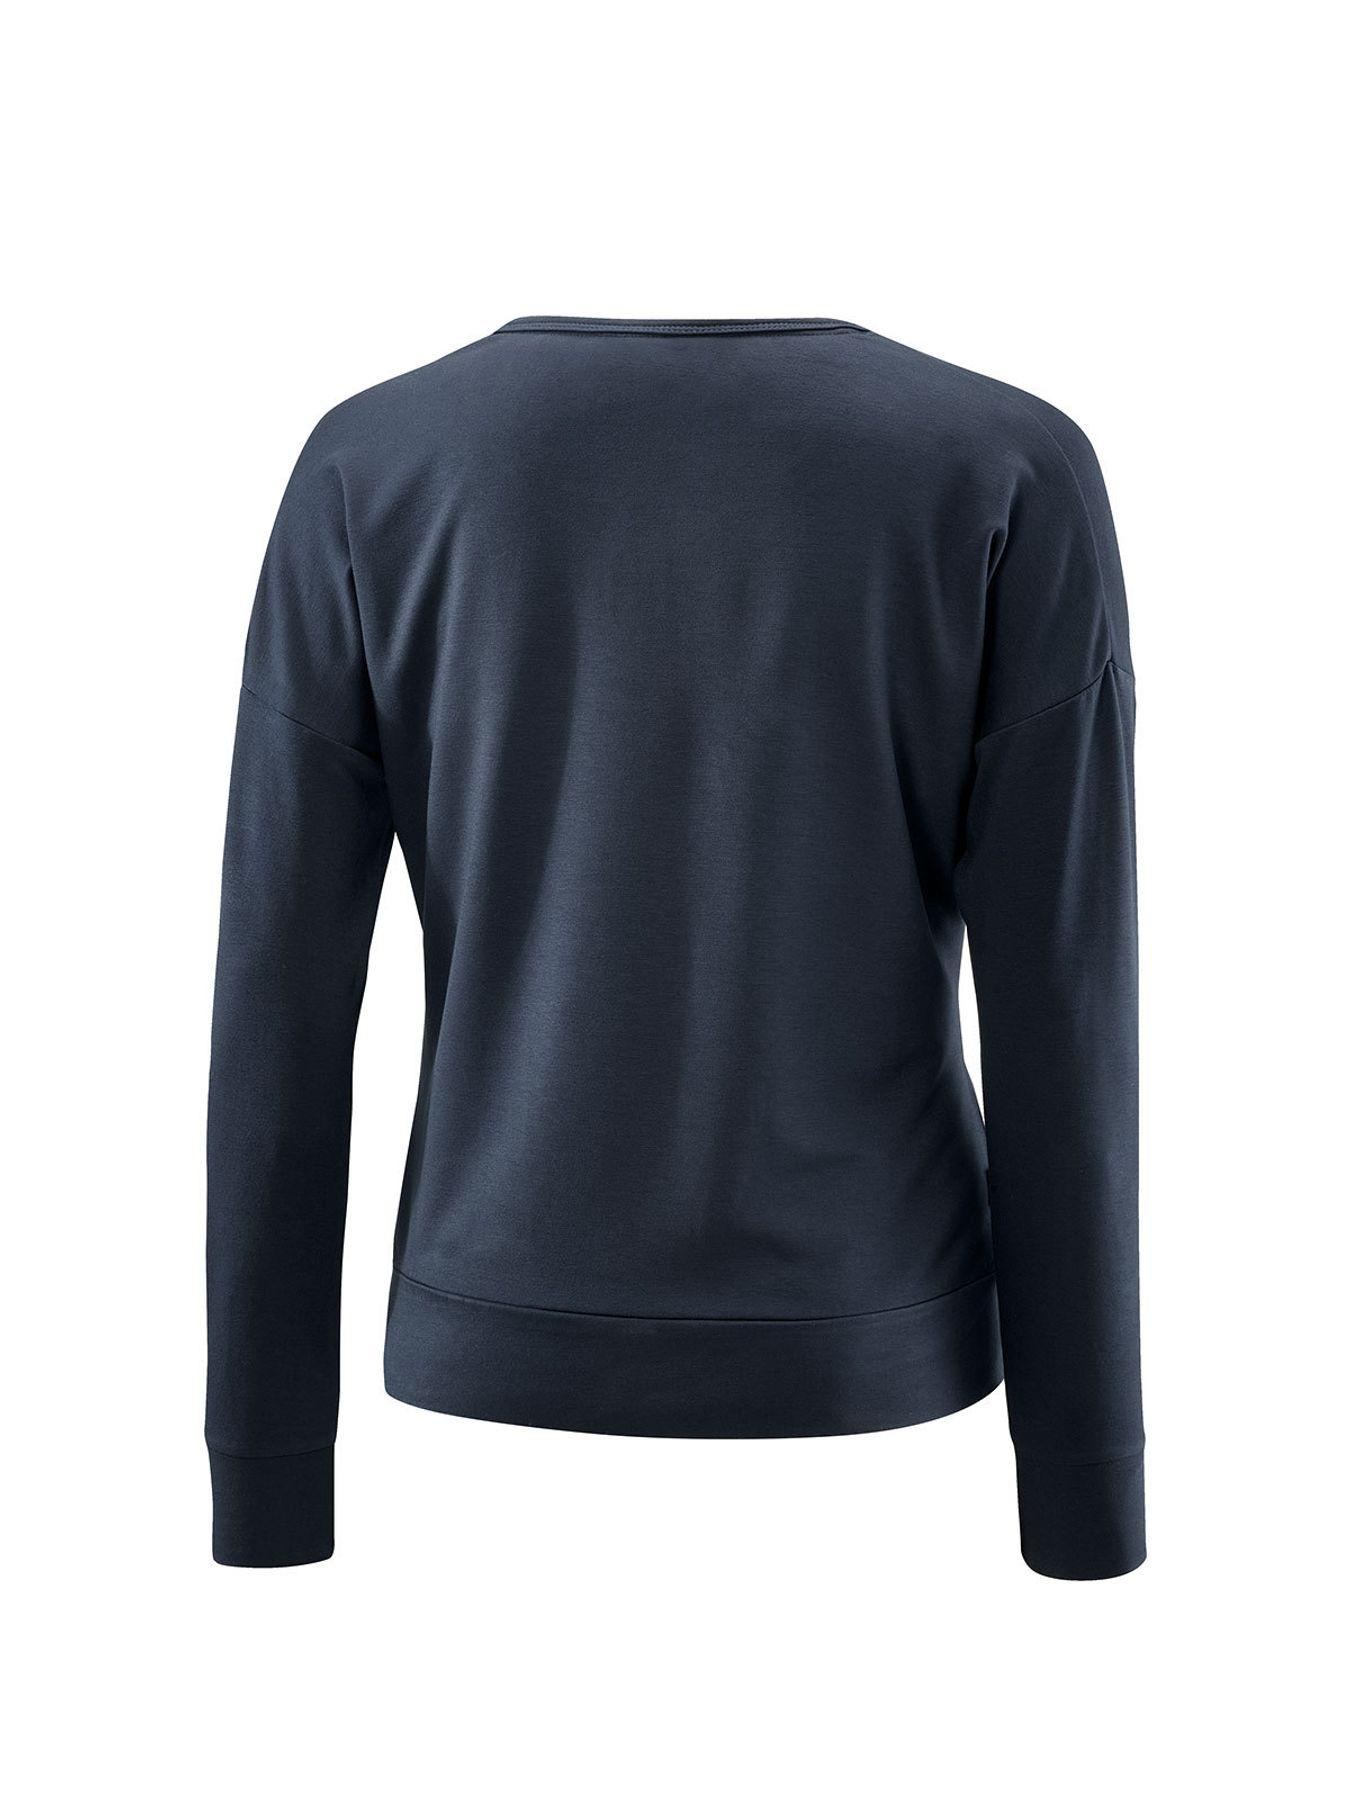 Joy - Damen Langarmshirt in Night blue, Zenia (34485 A) – Bild 3